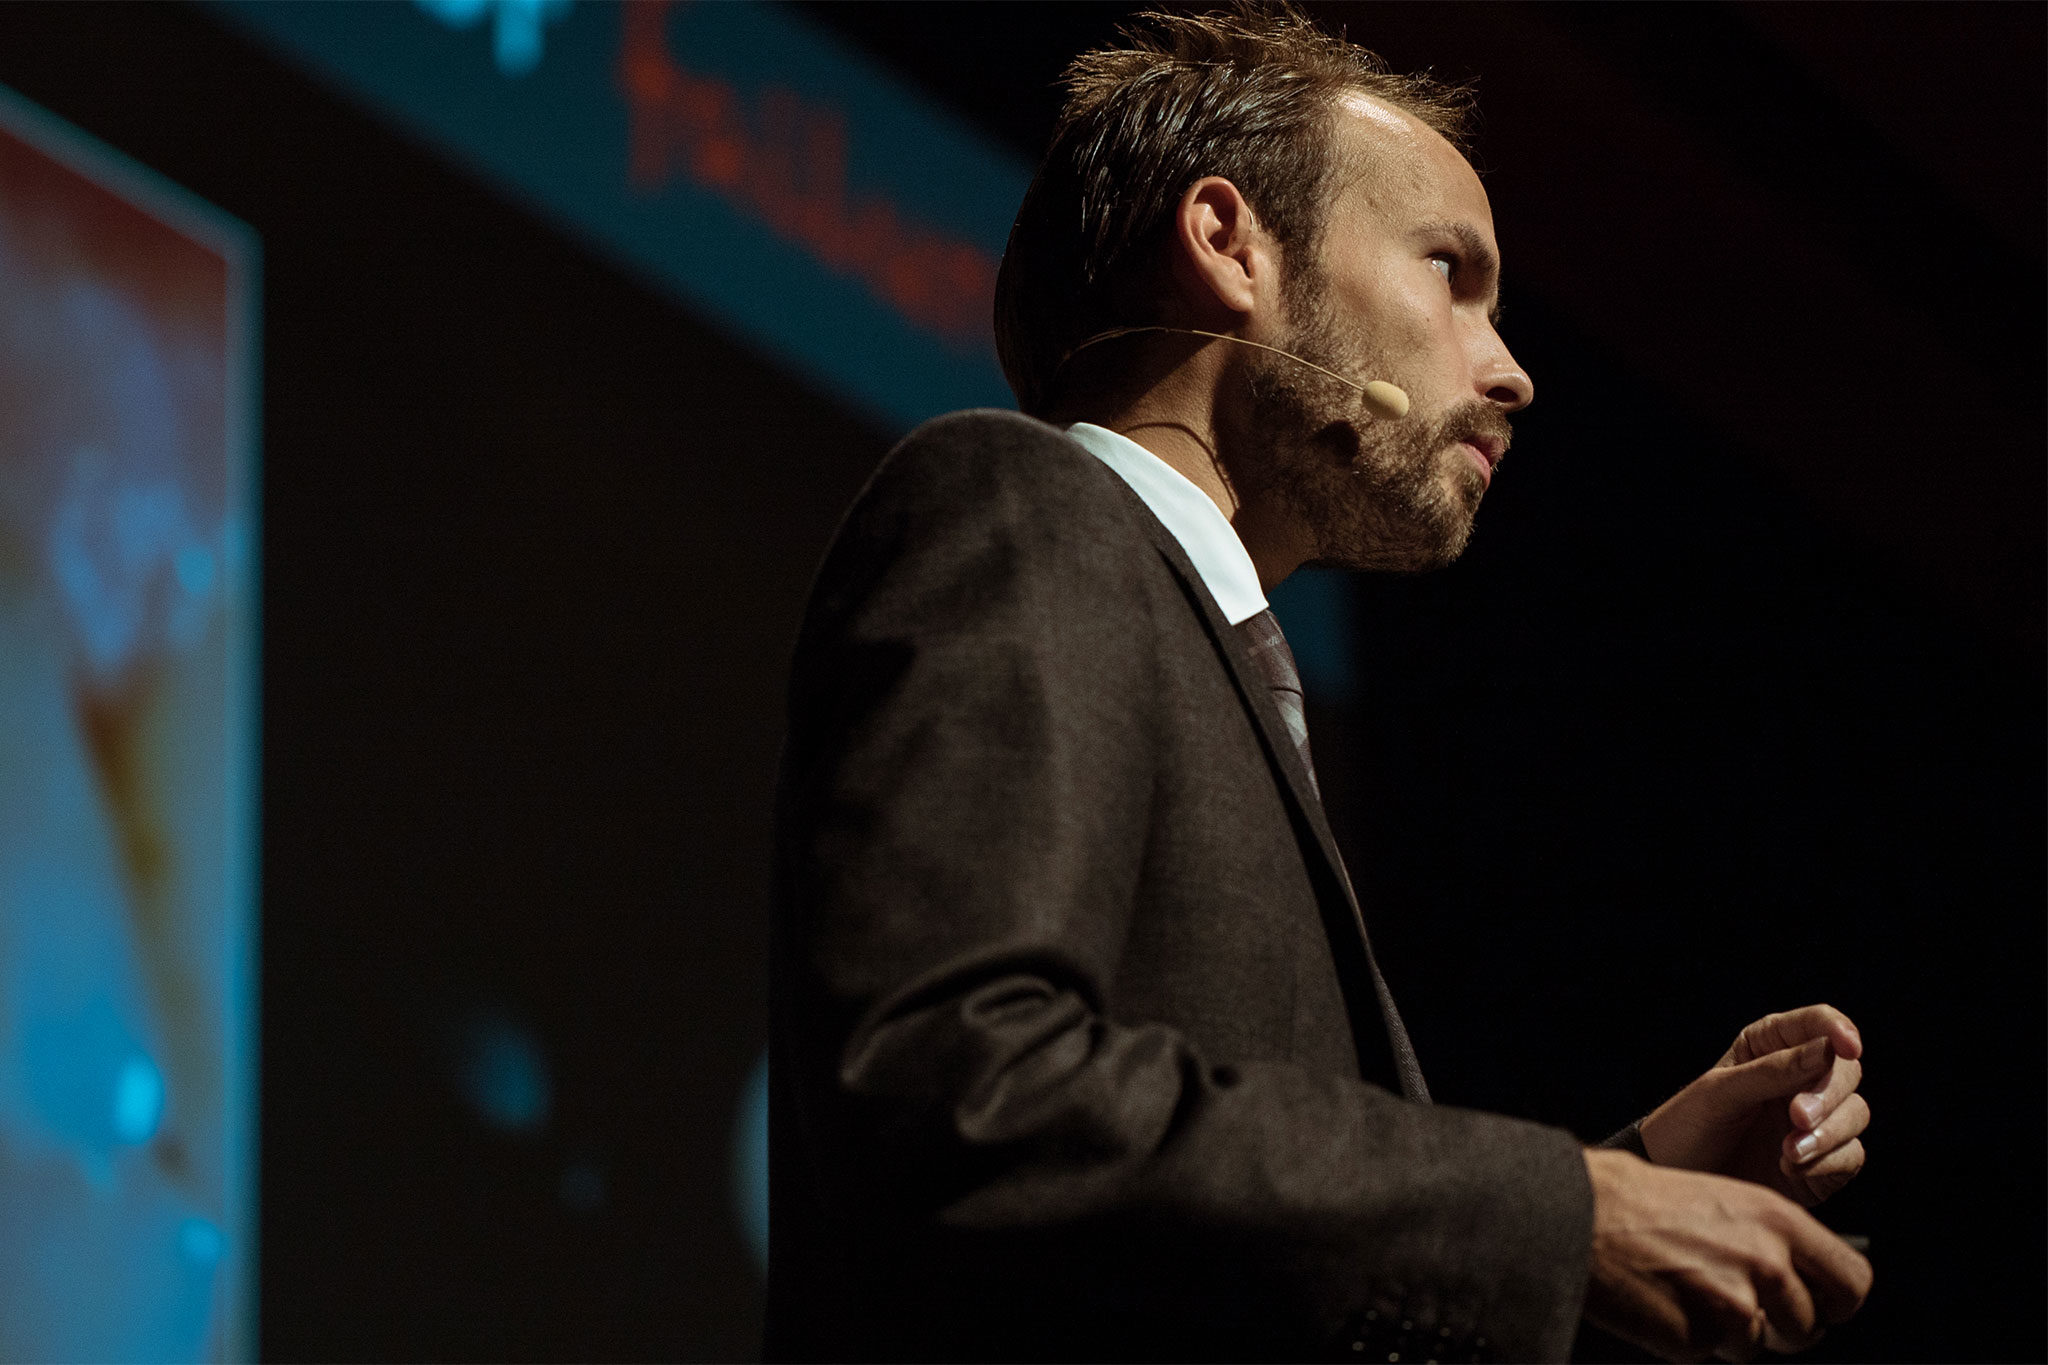 Vincent Fehmer: Das Problem der Vollkeramik liegt bei der Verblendung